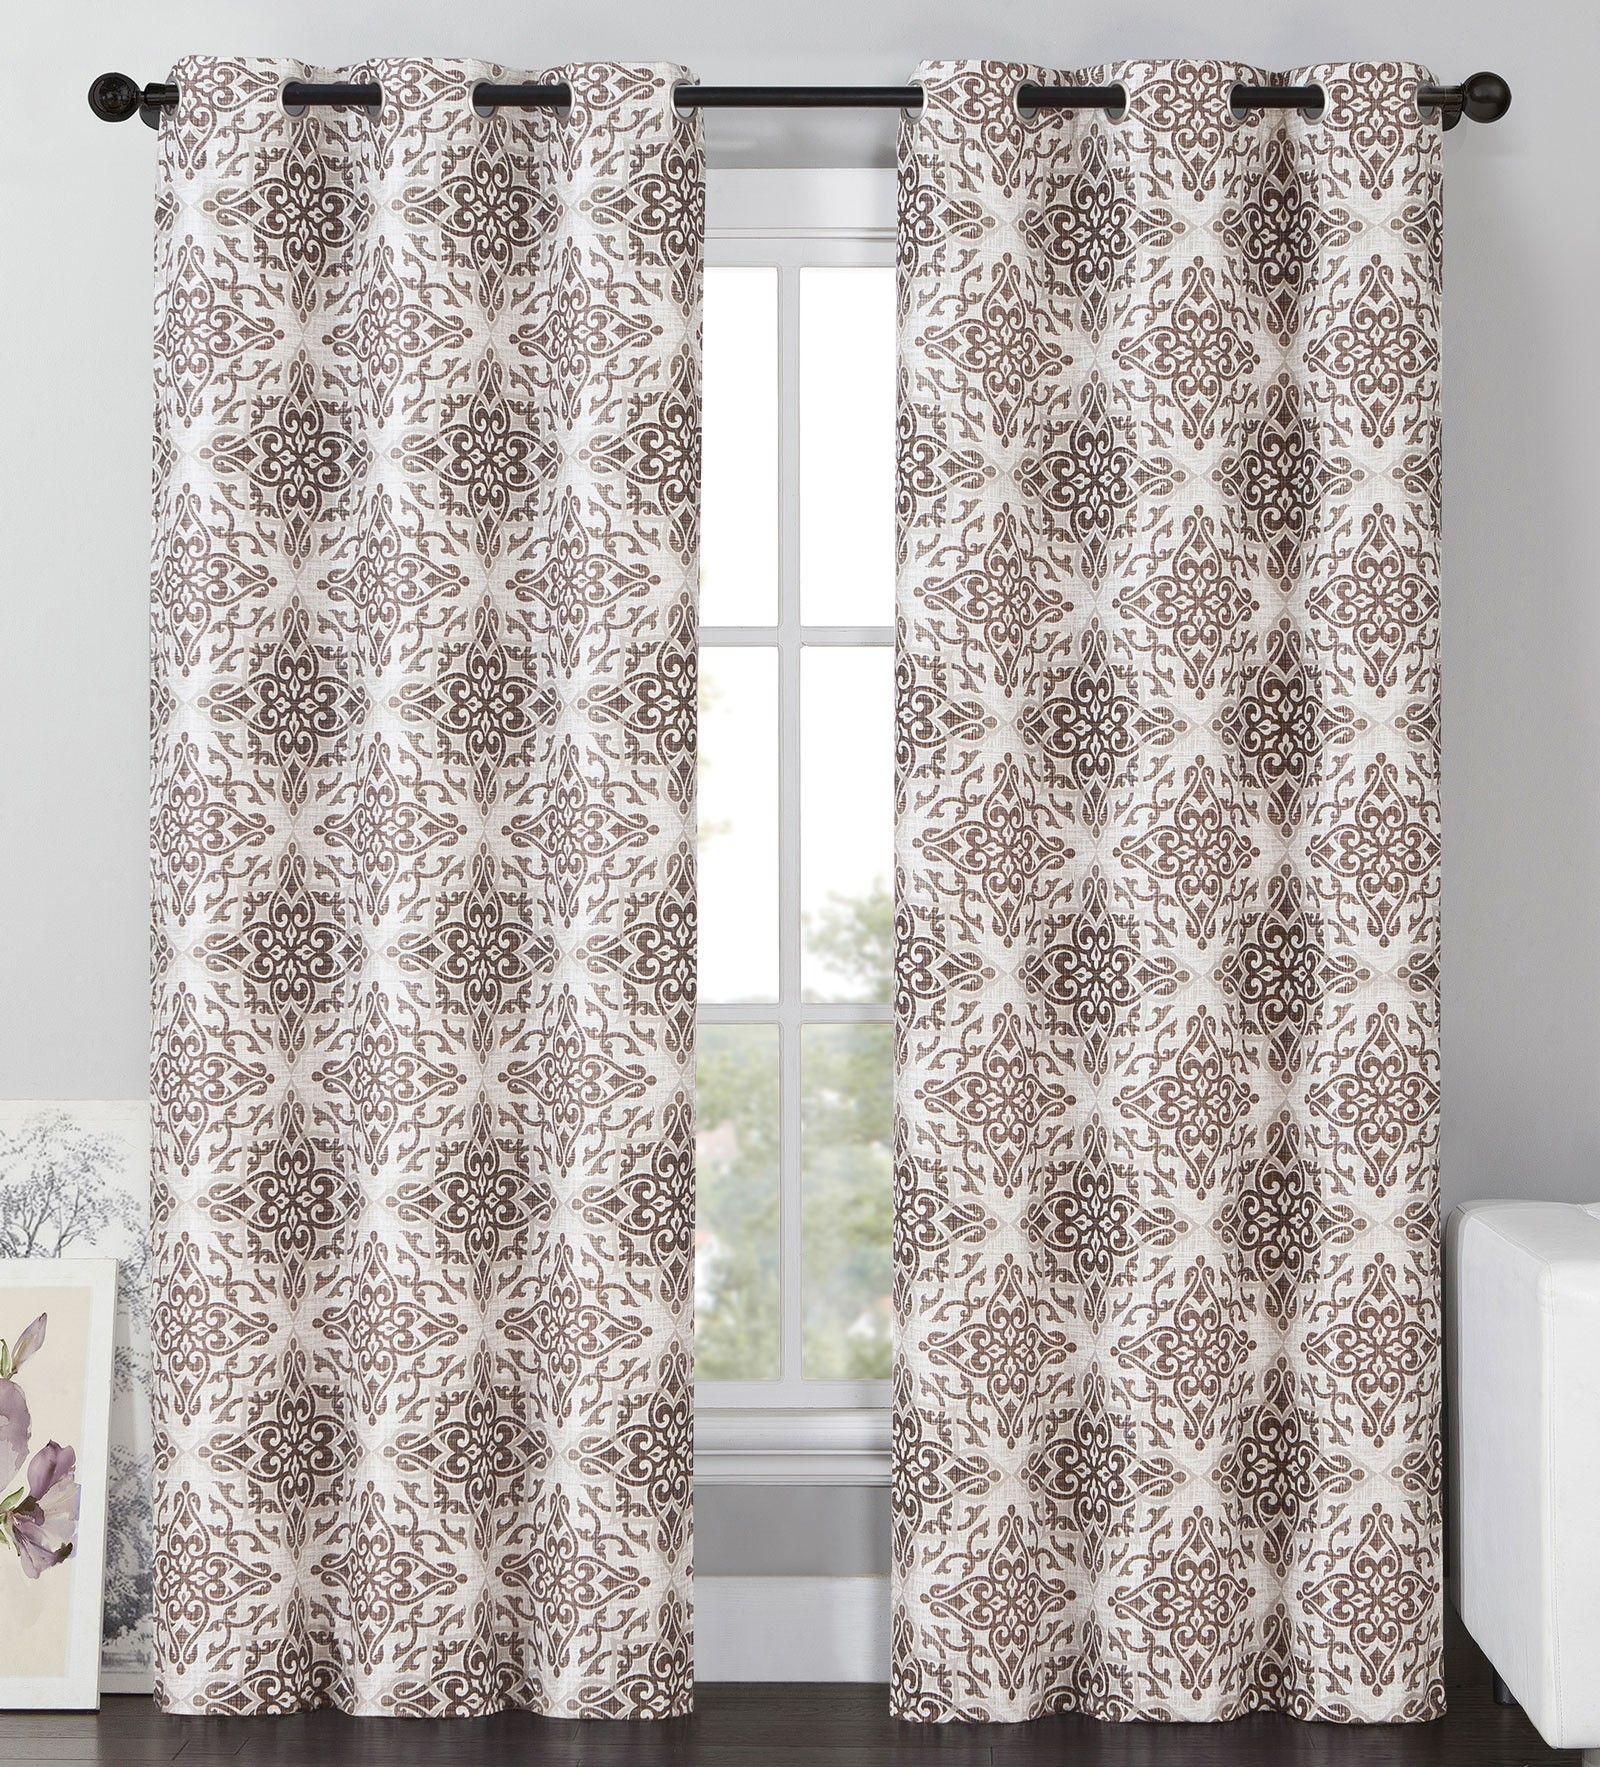 patio drapes smsender with co grommets door grey tulum